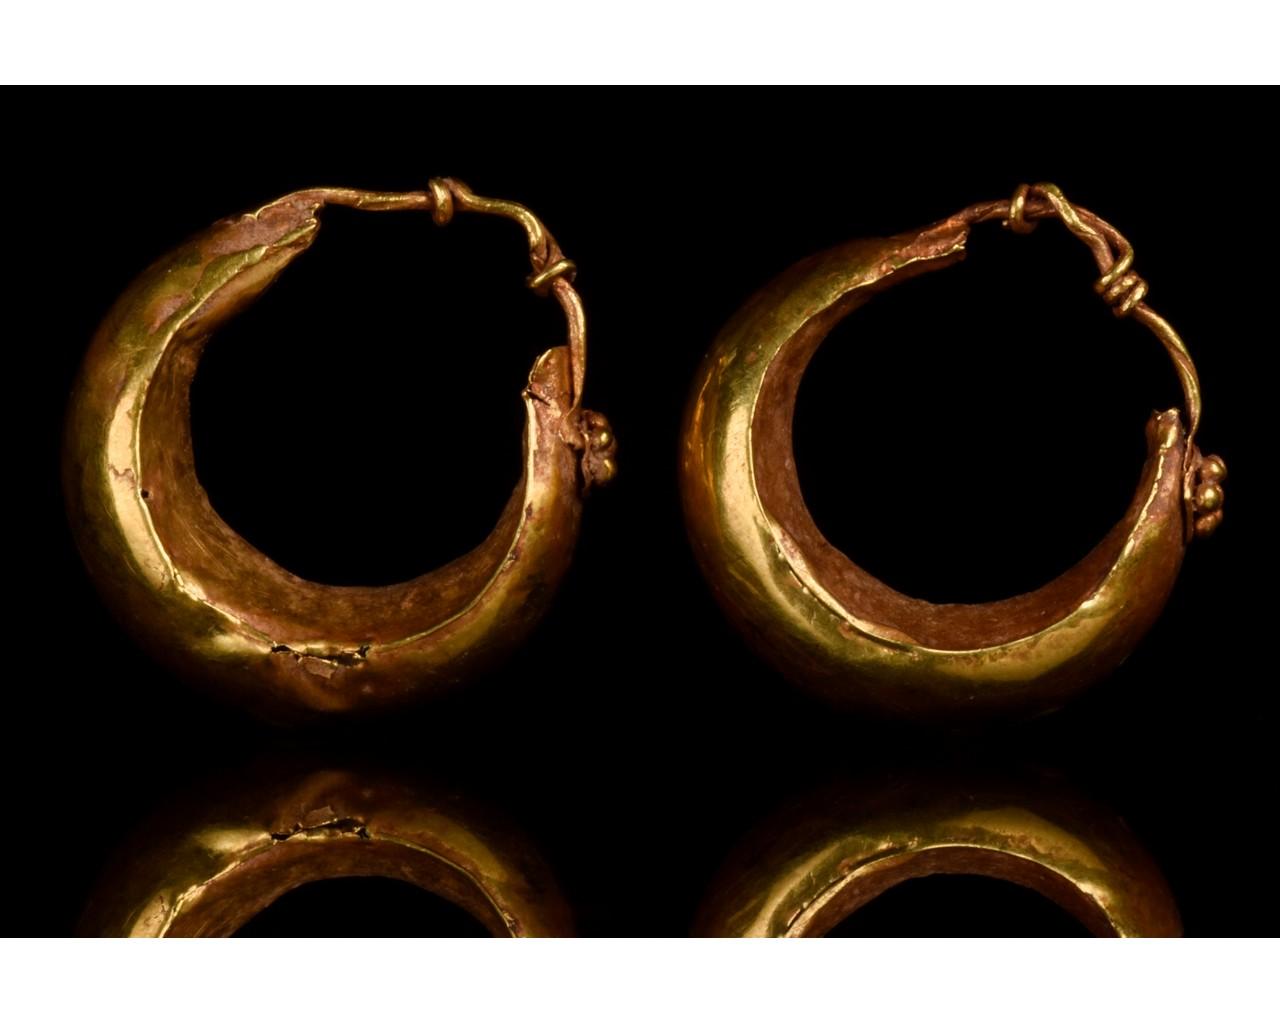 PAIR OF ROMAN GOLD BOAT SHAPED EARRINGS - FULL ANALYSIS